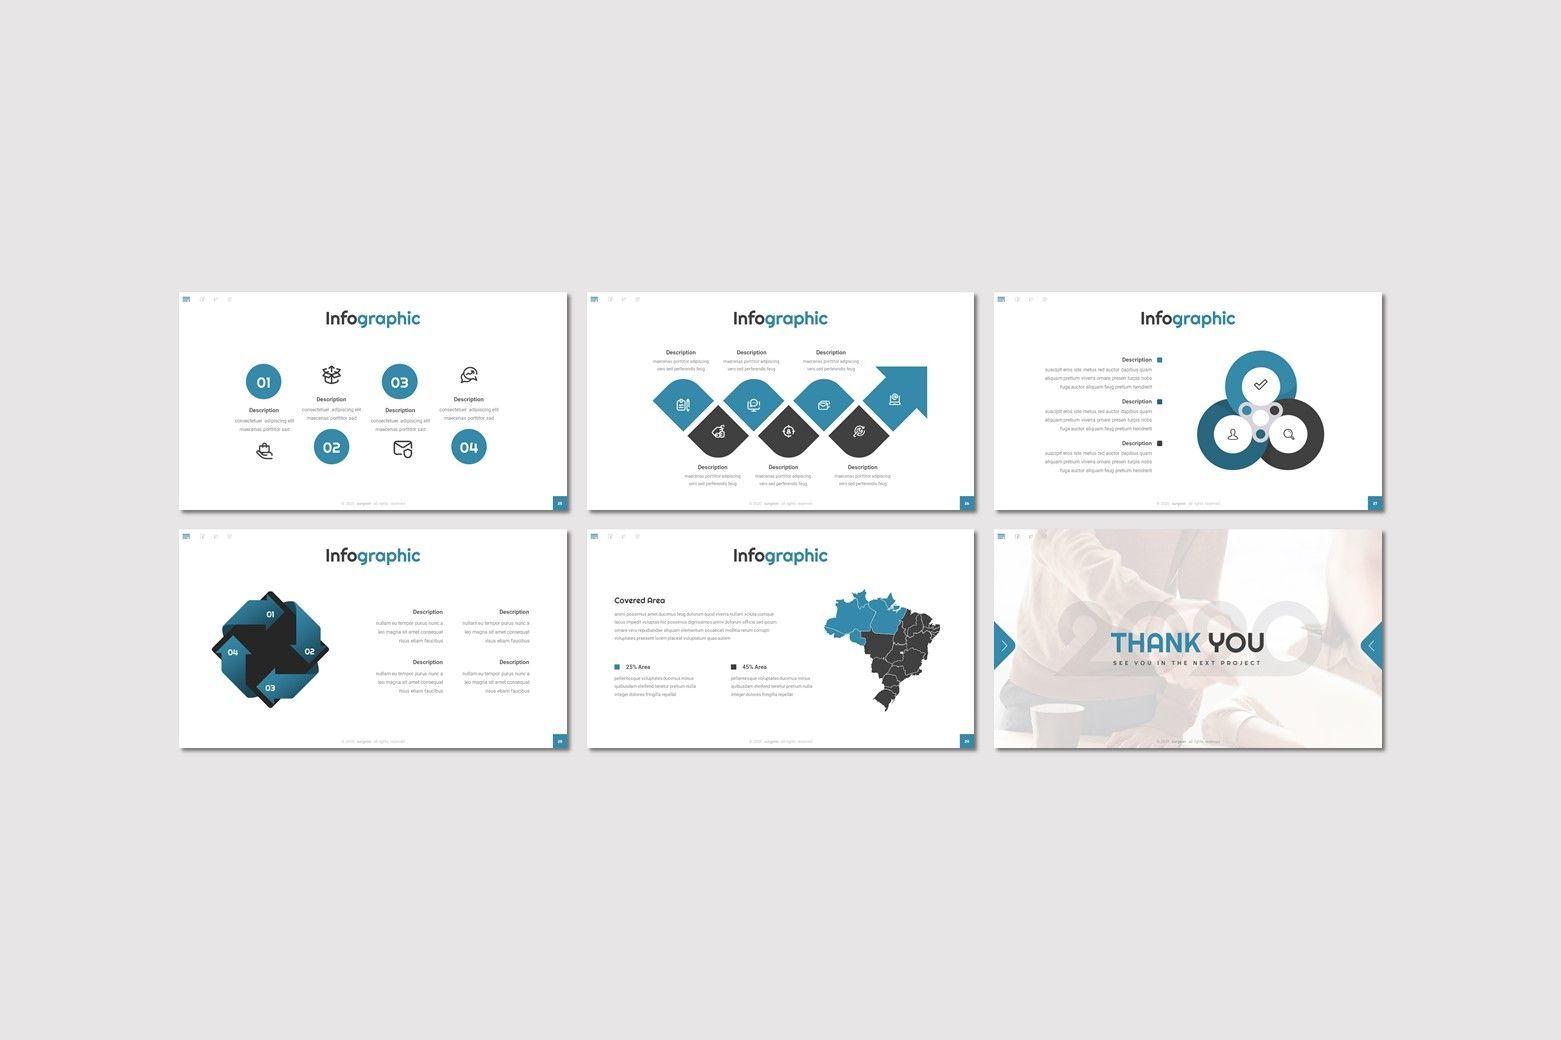 Surgeon - Google Slides Template, Slide 4, 07972, Presentation Templates — PoweredTemplate.com